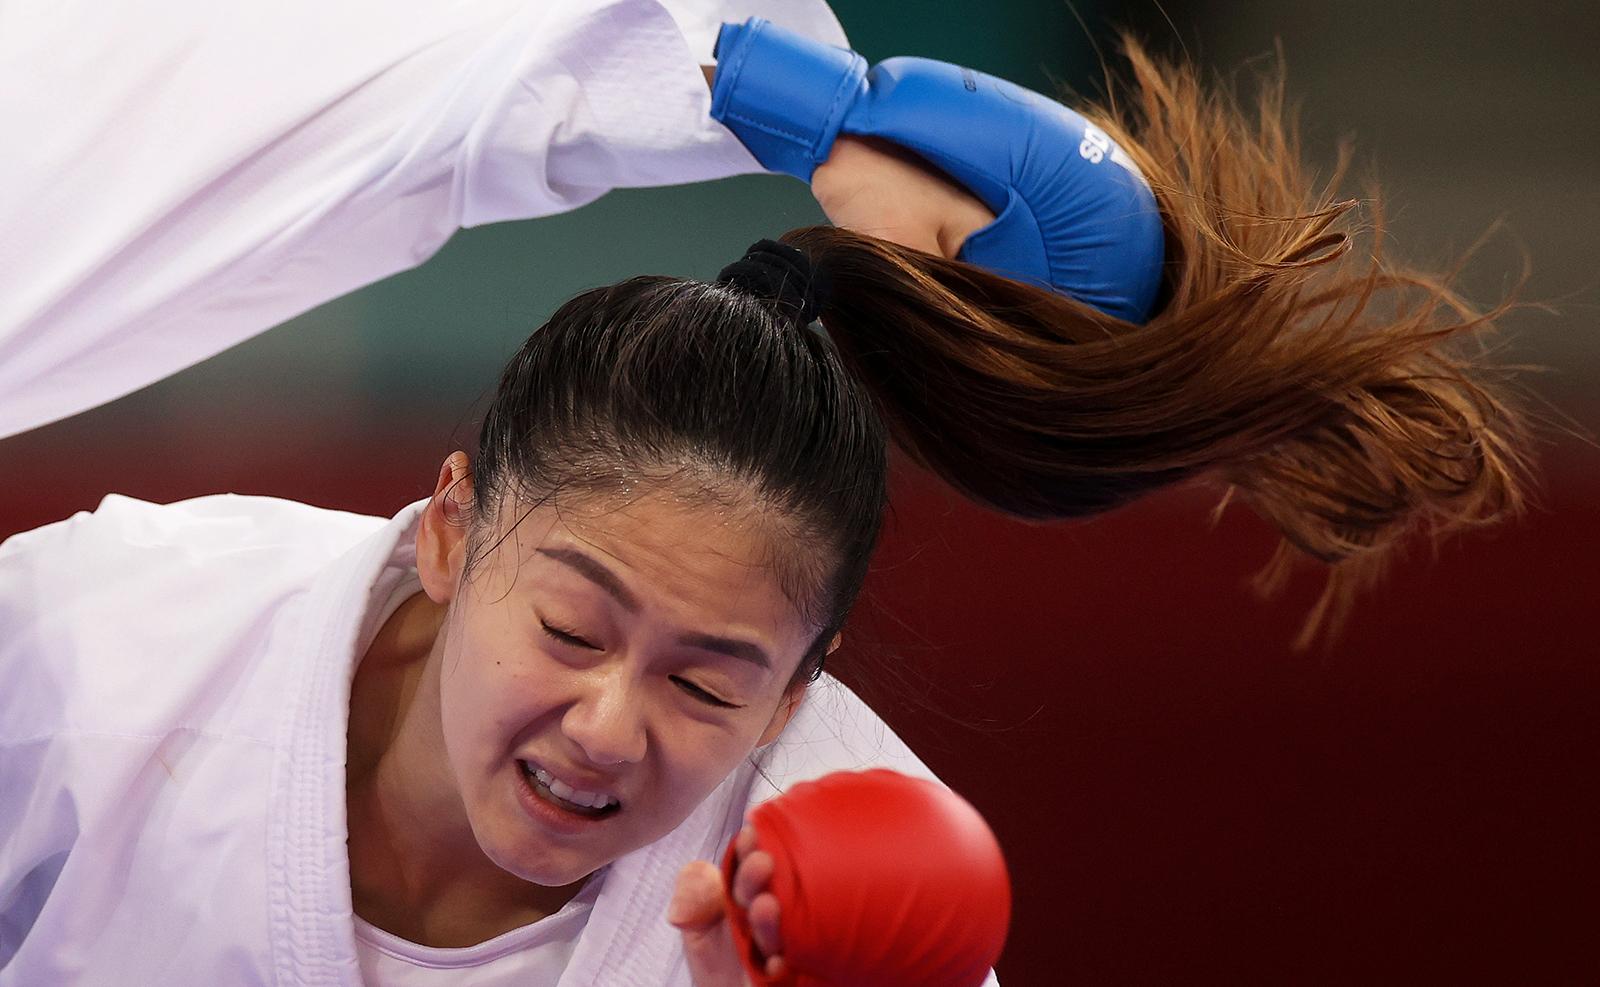 Tokyo 2020 Olympics - Karate - Women's -55kg Kumite - Pool A - Nippon Budokan, Tokyo, Japan - August 5, 2021. Wen Tzu-Yun of Taiwan reacts while in action against Sara Bahmanyar of Iran. REUTERS